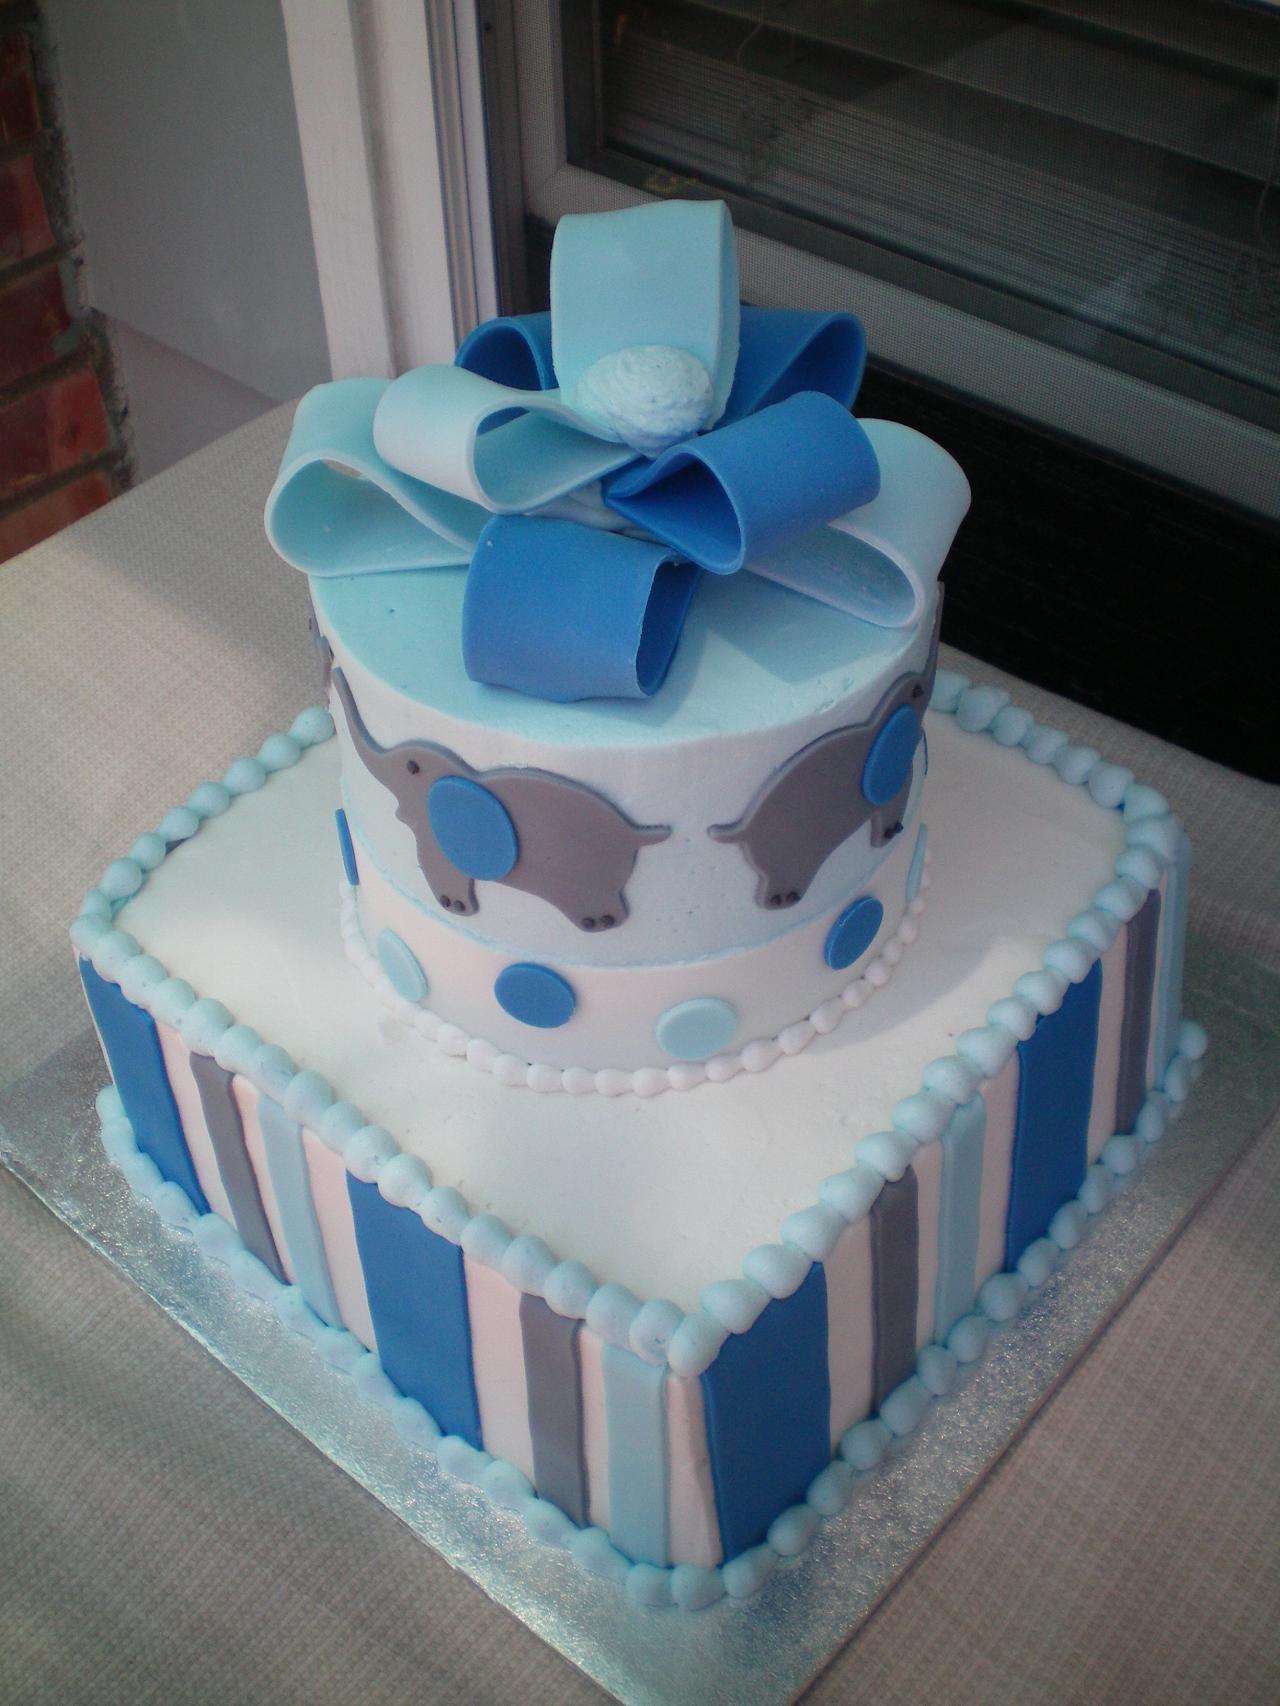 Elephant Baby Shower Cake Www.allaboutrachelacakes.com